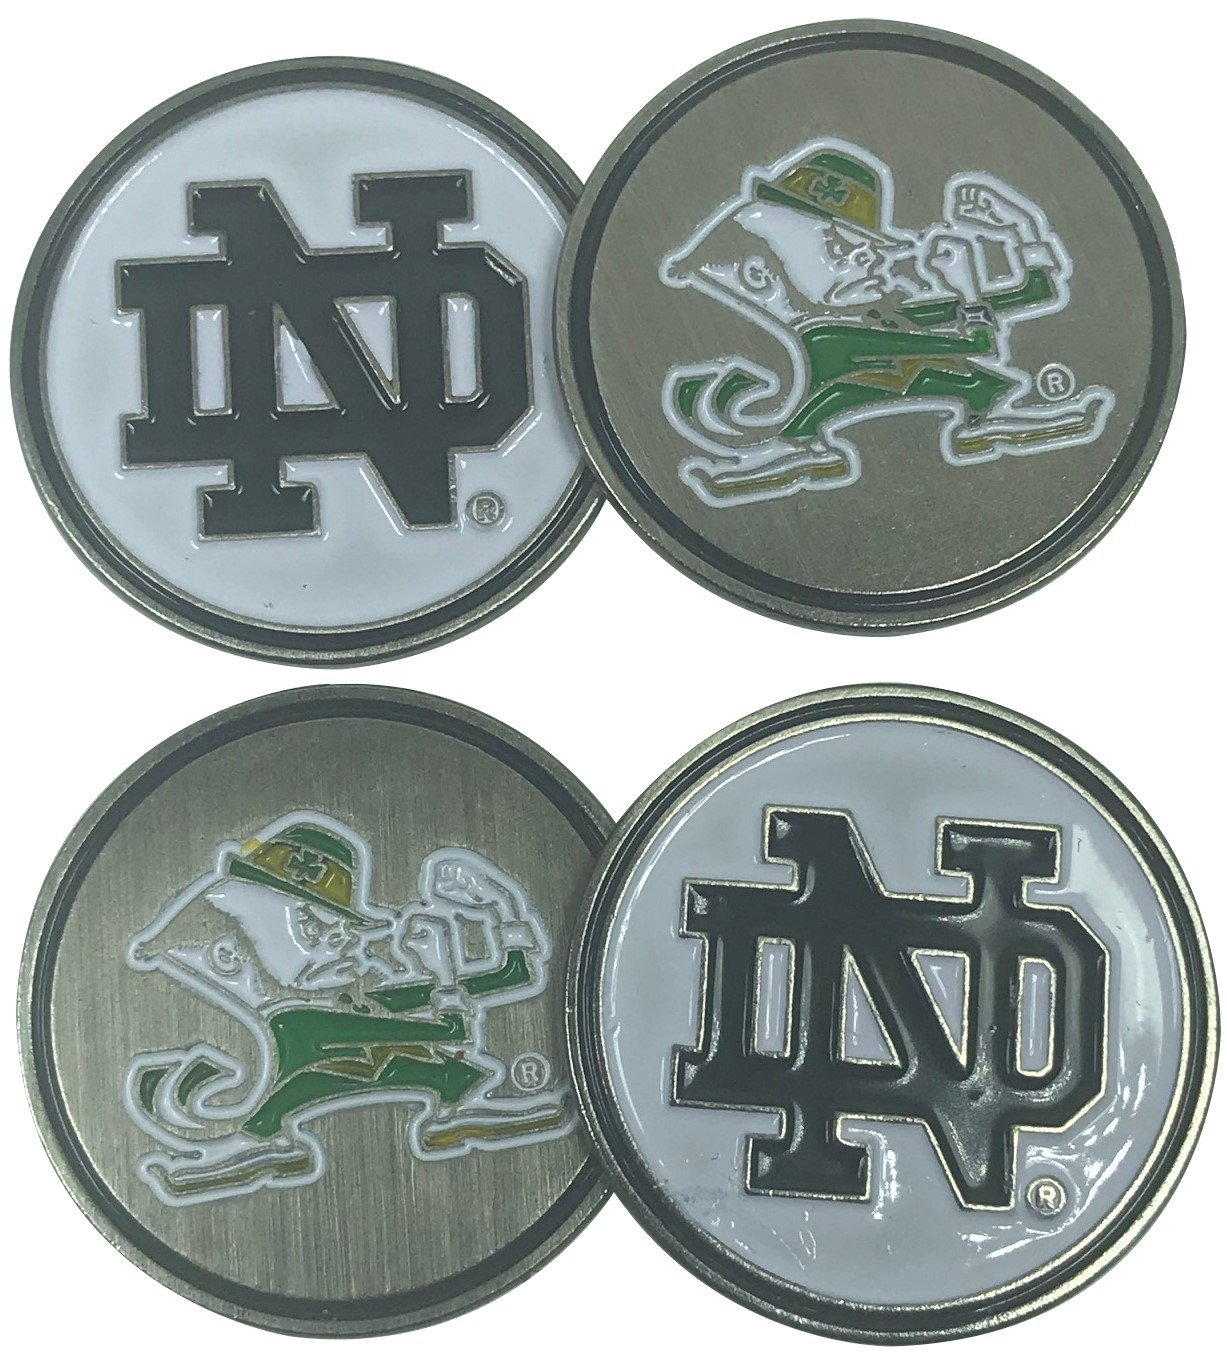 Alumniゴルフ(チームゴルフ) University of Notre Dame Fighting Irish 4つ(4 ) ゴルフボールマーカー – 2 Sided   B07FRPXCMG